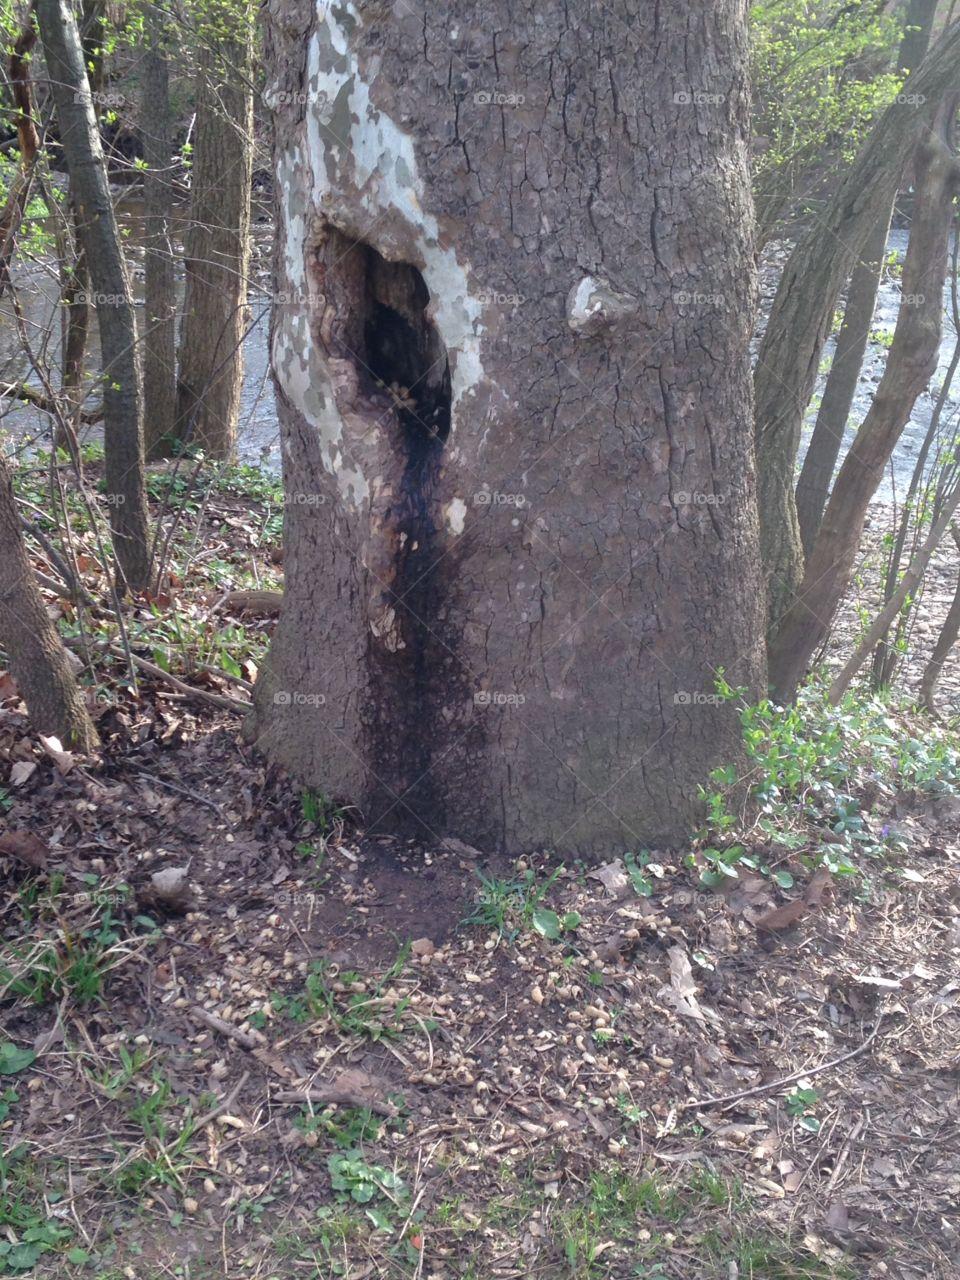 Squirrel stash in the park. Squirrel stash in the park